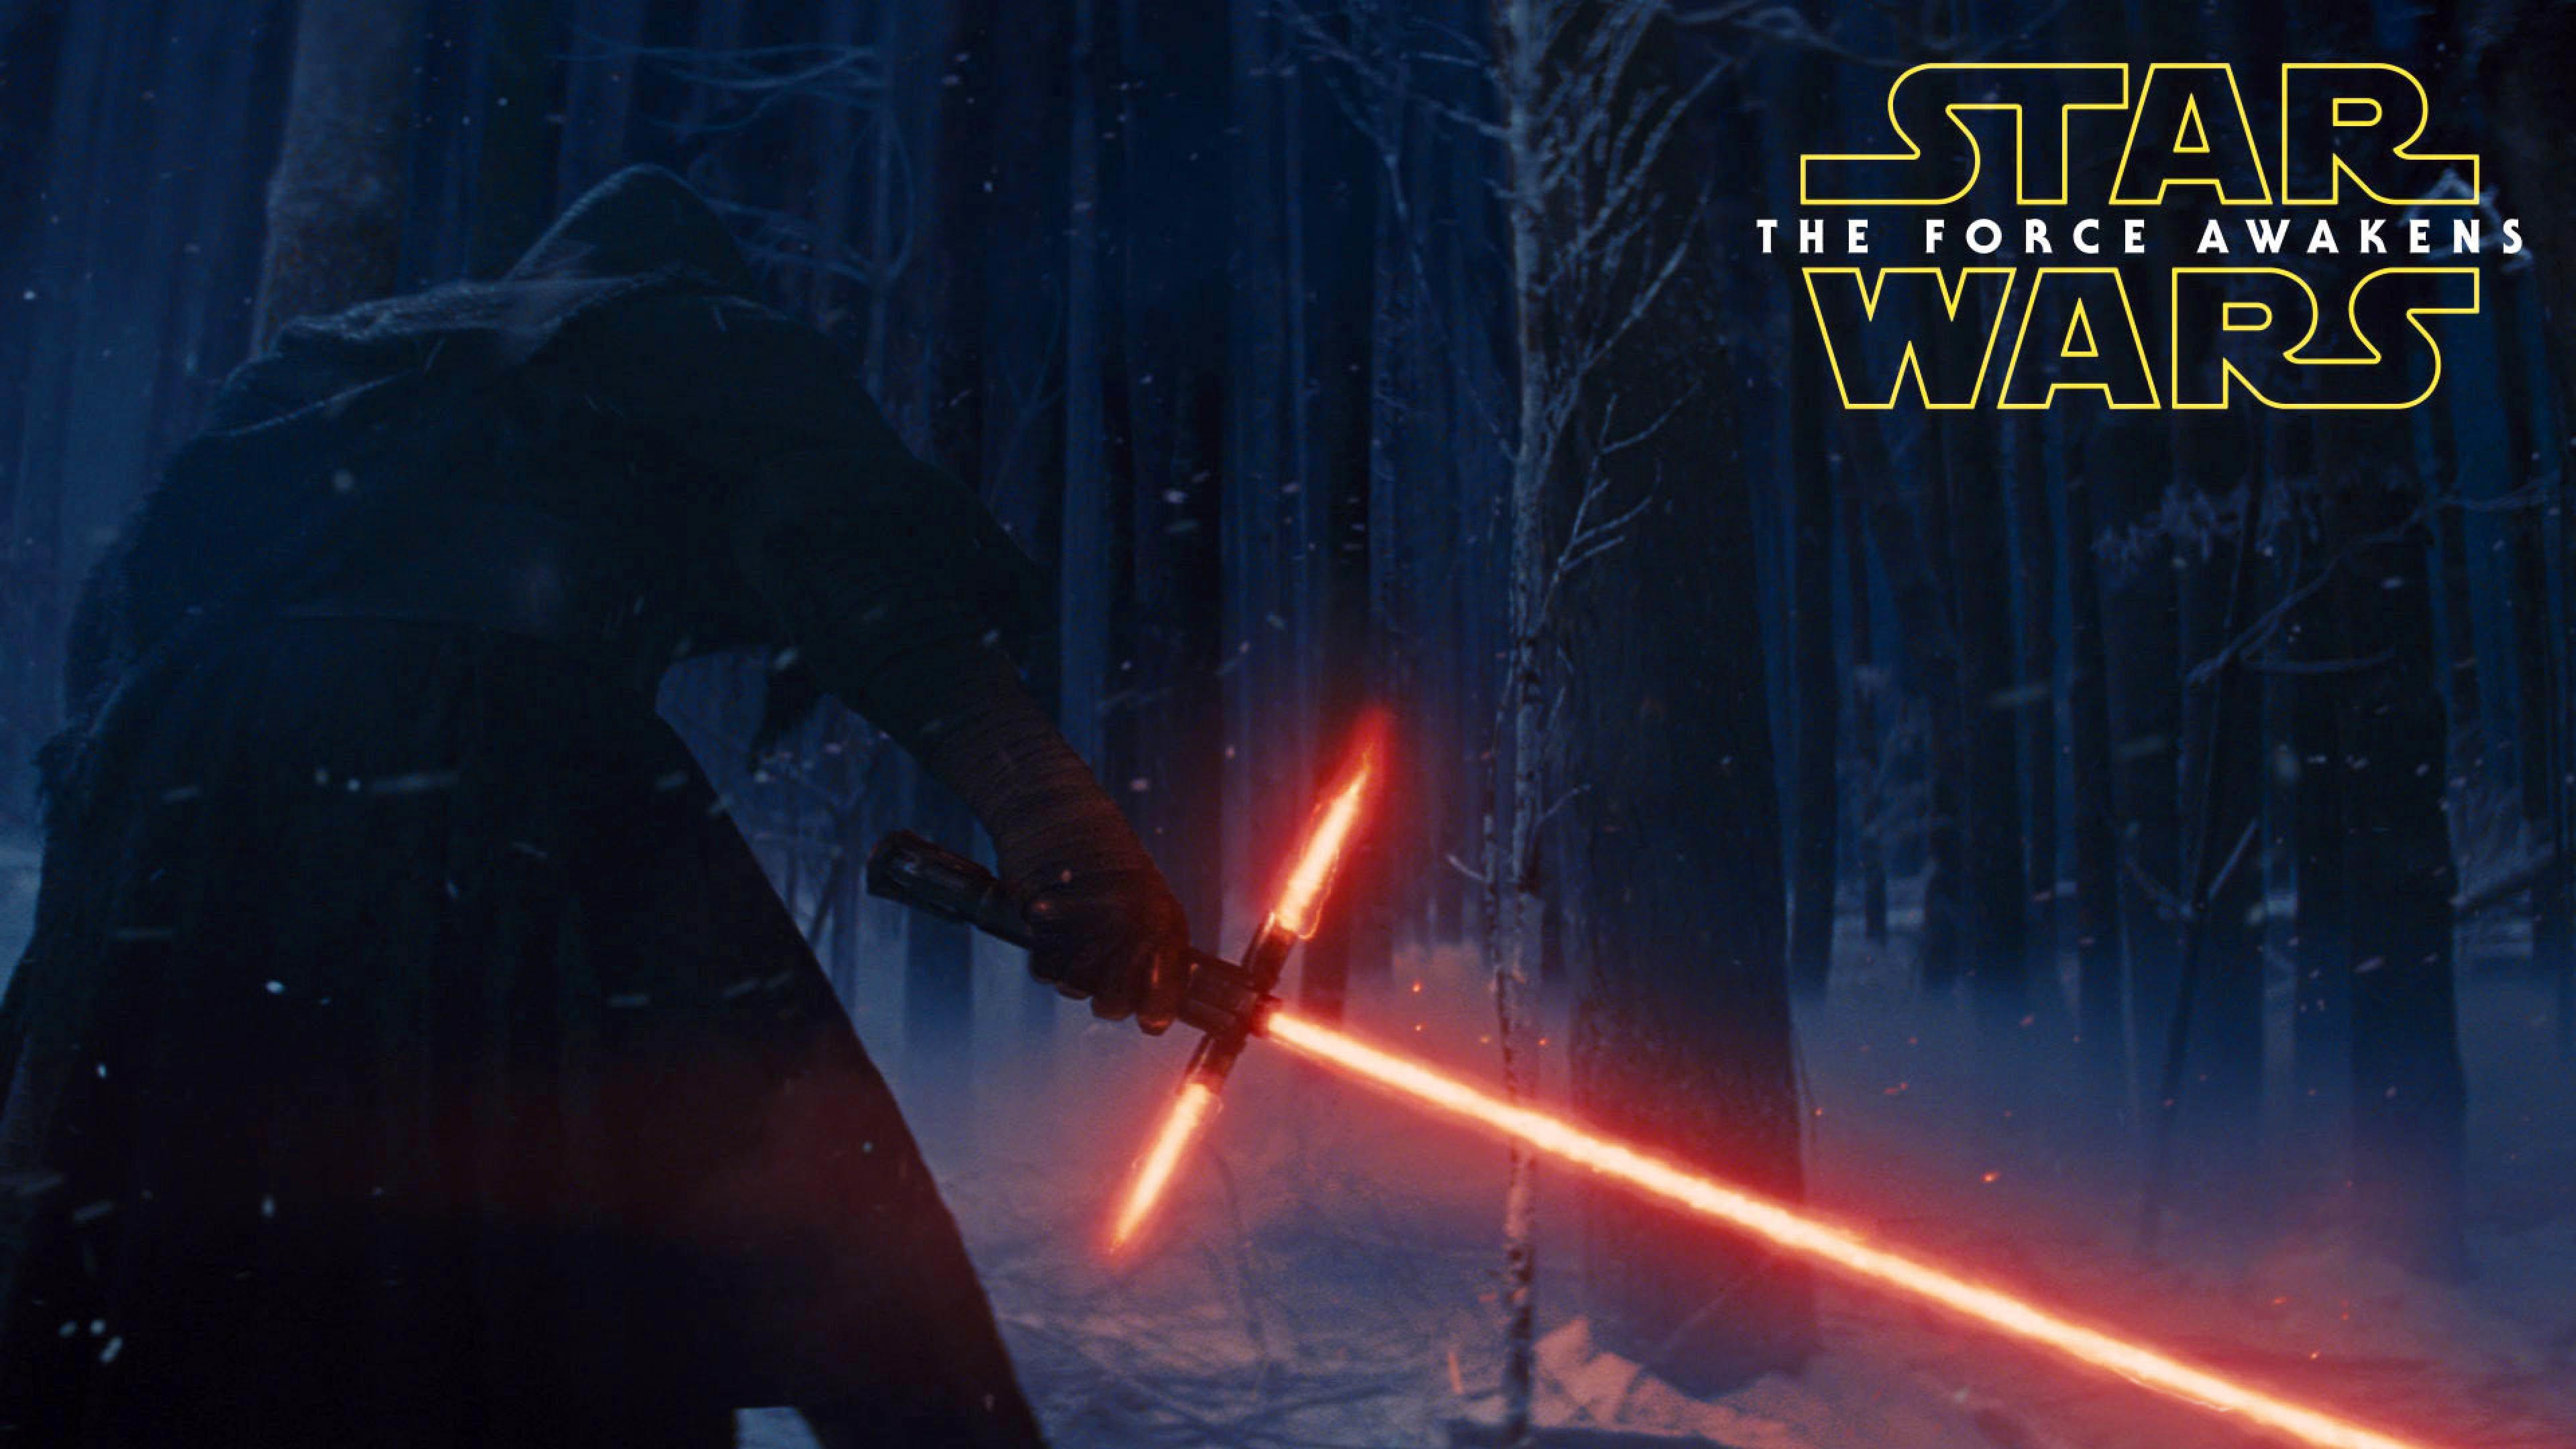 Kylo Ren's Crossguard Lightsaber – Star Wars: The Force Awakens  wallpaper